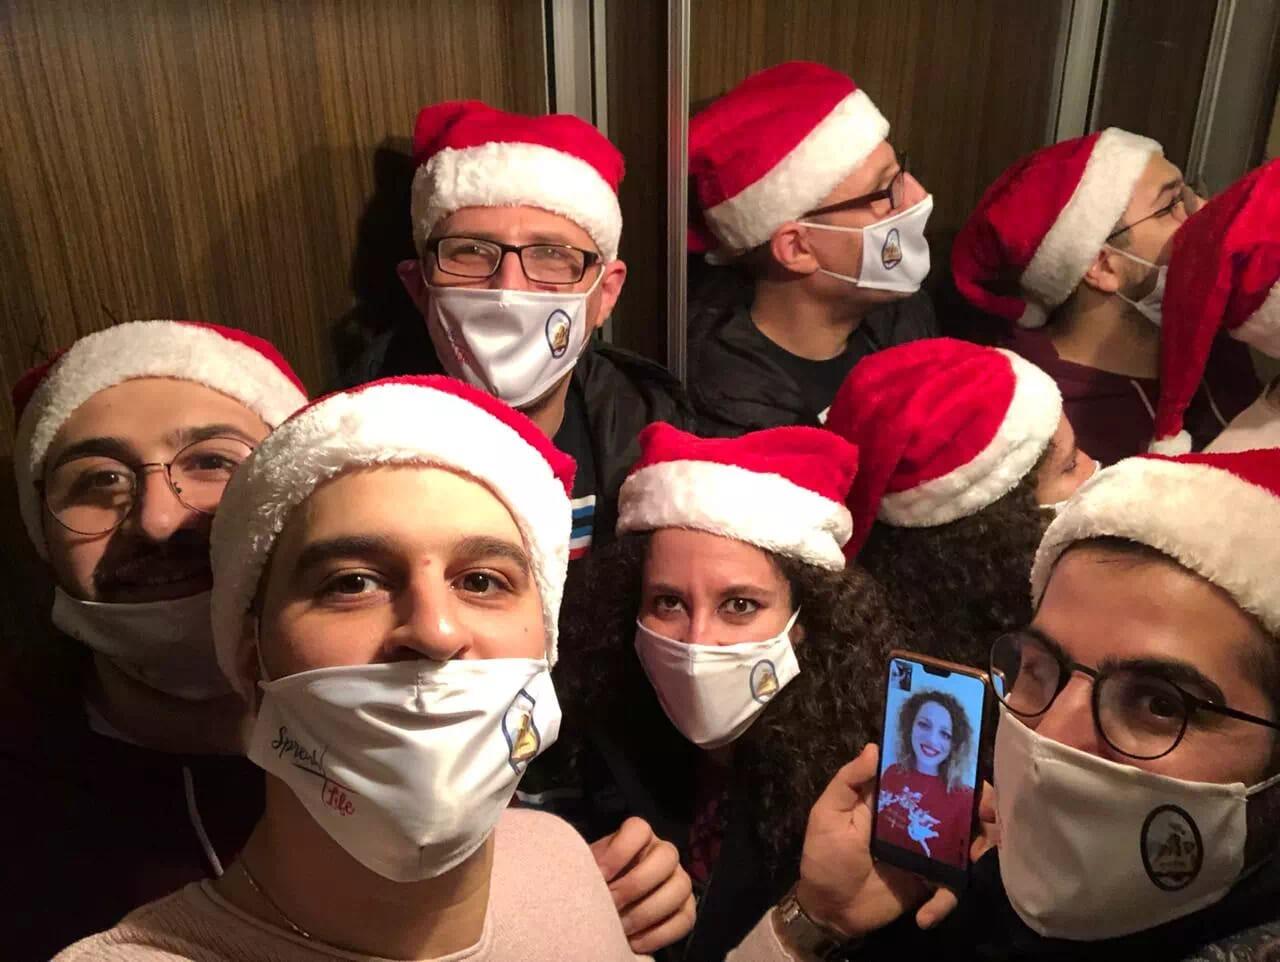 https://eundemia.sirv.com/Images/christmas/456916.webp